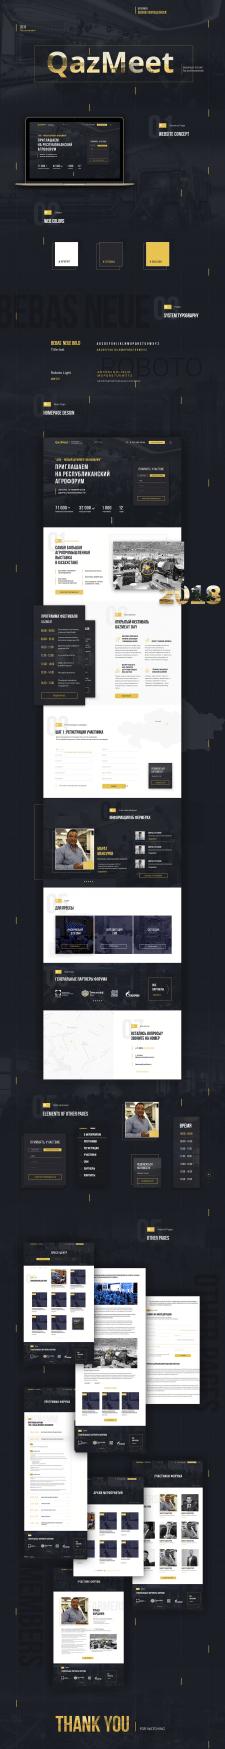 Site - QazMeet